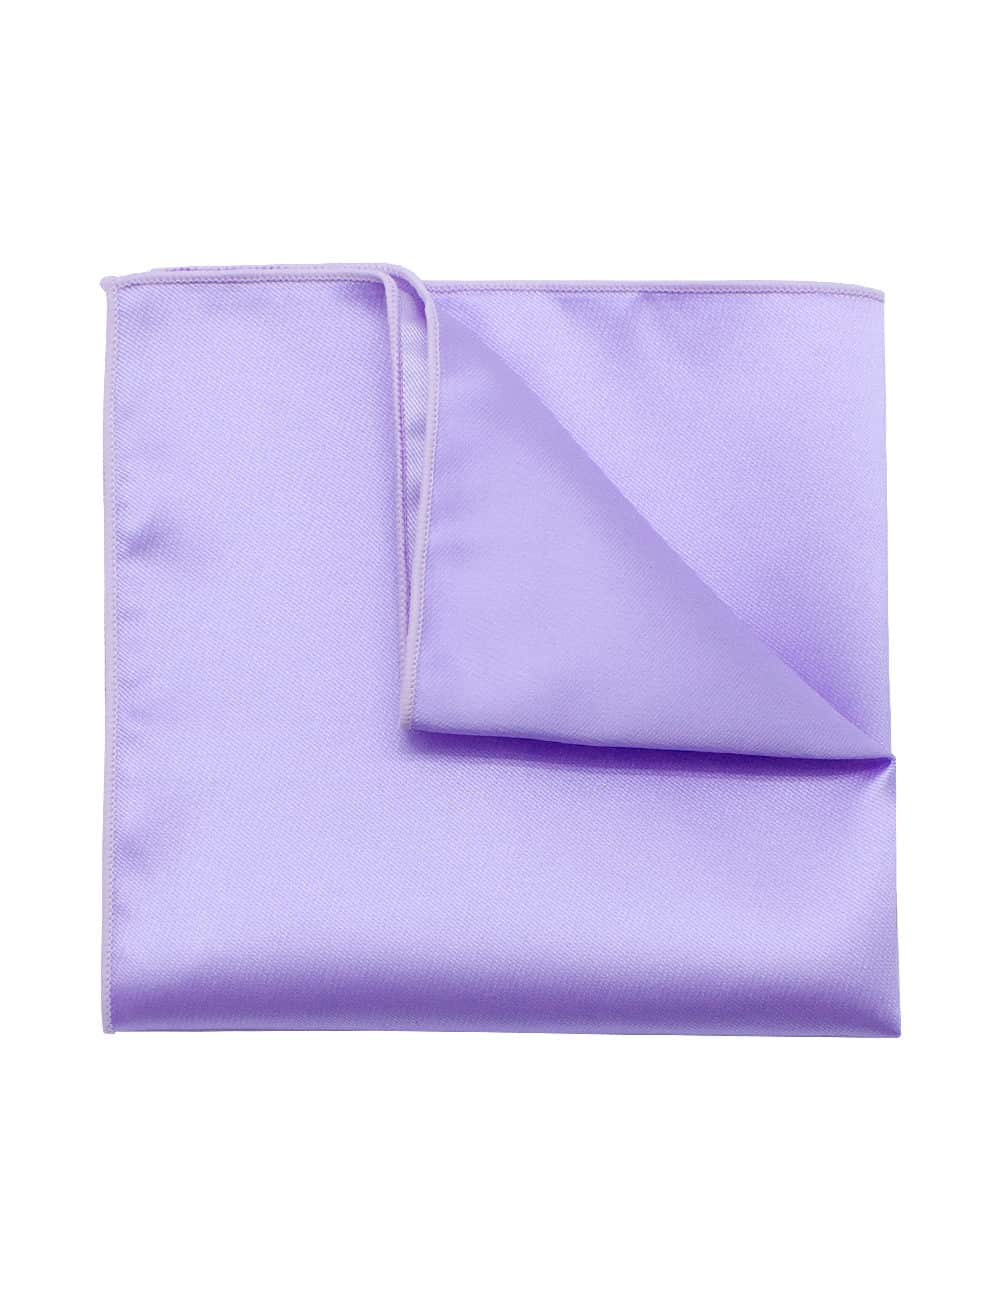 Solid Purple Haze Woven Pocket Square PSQ32.9